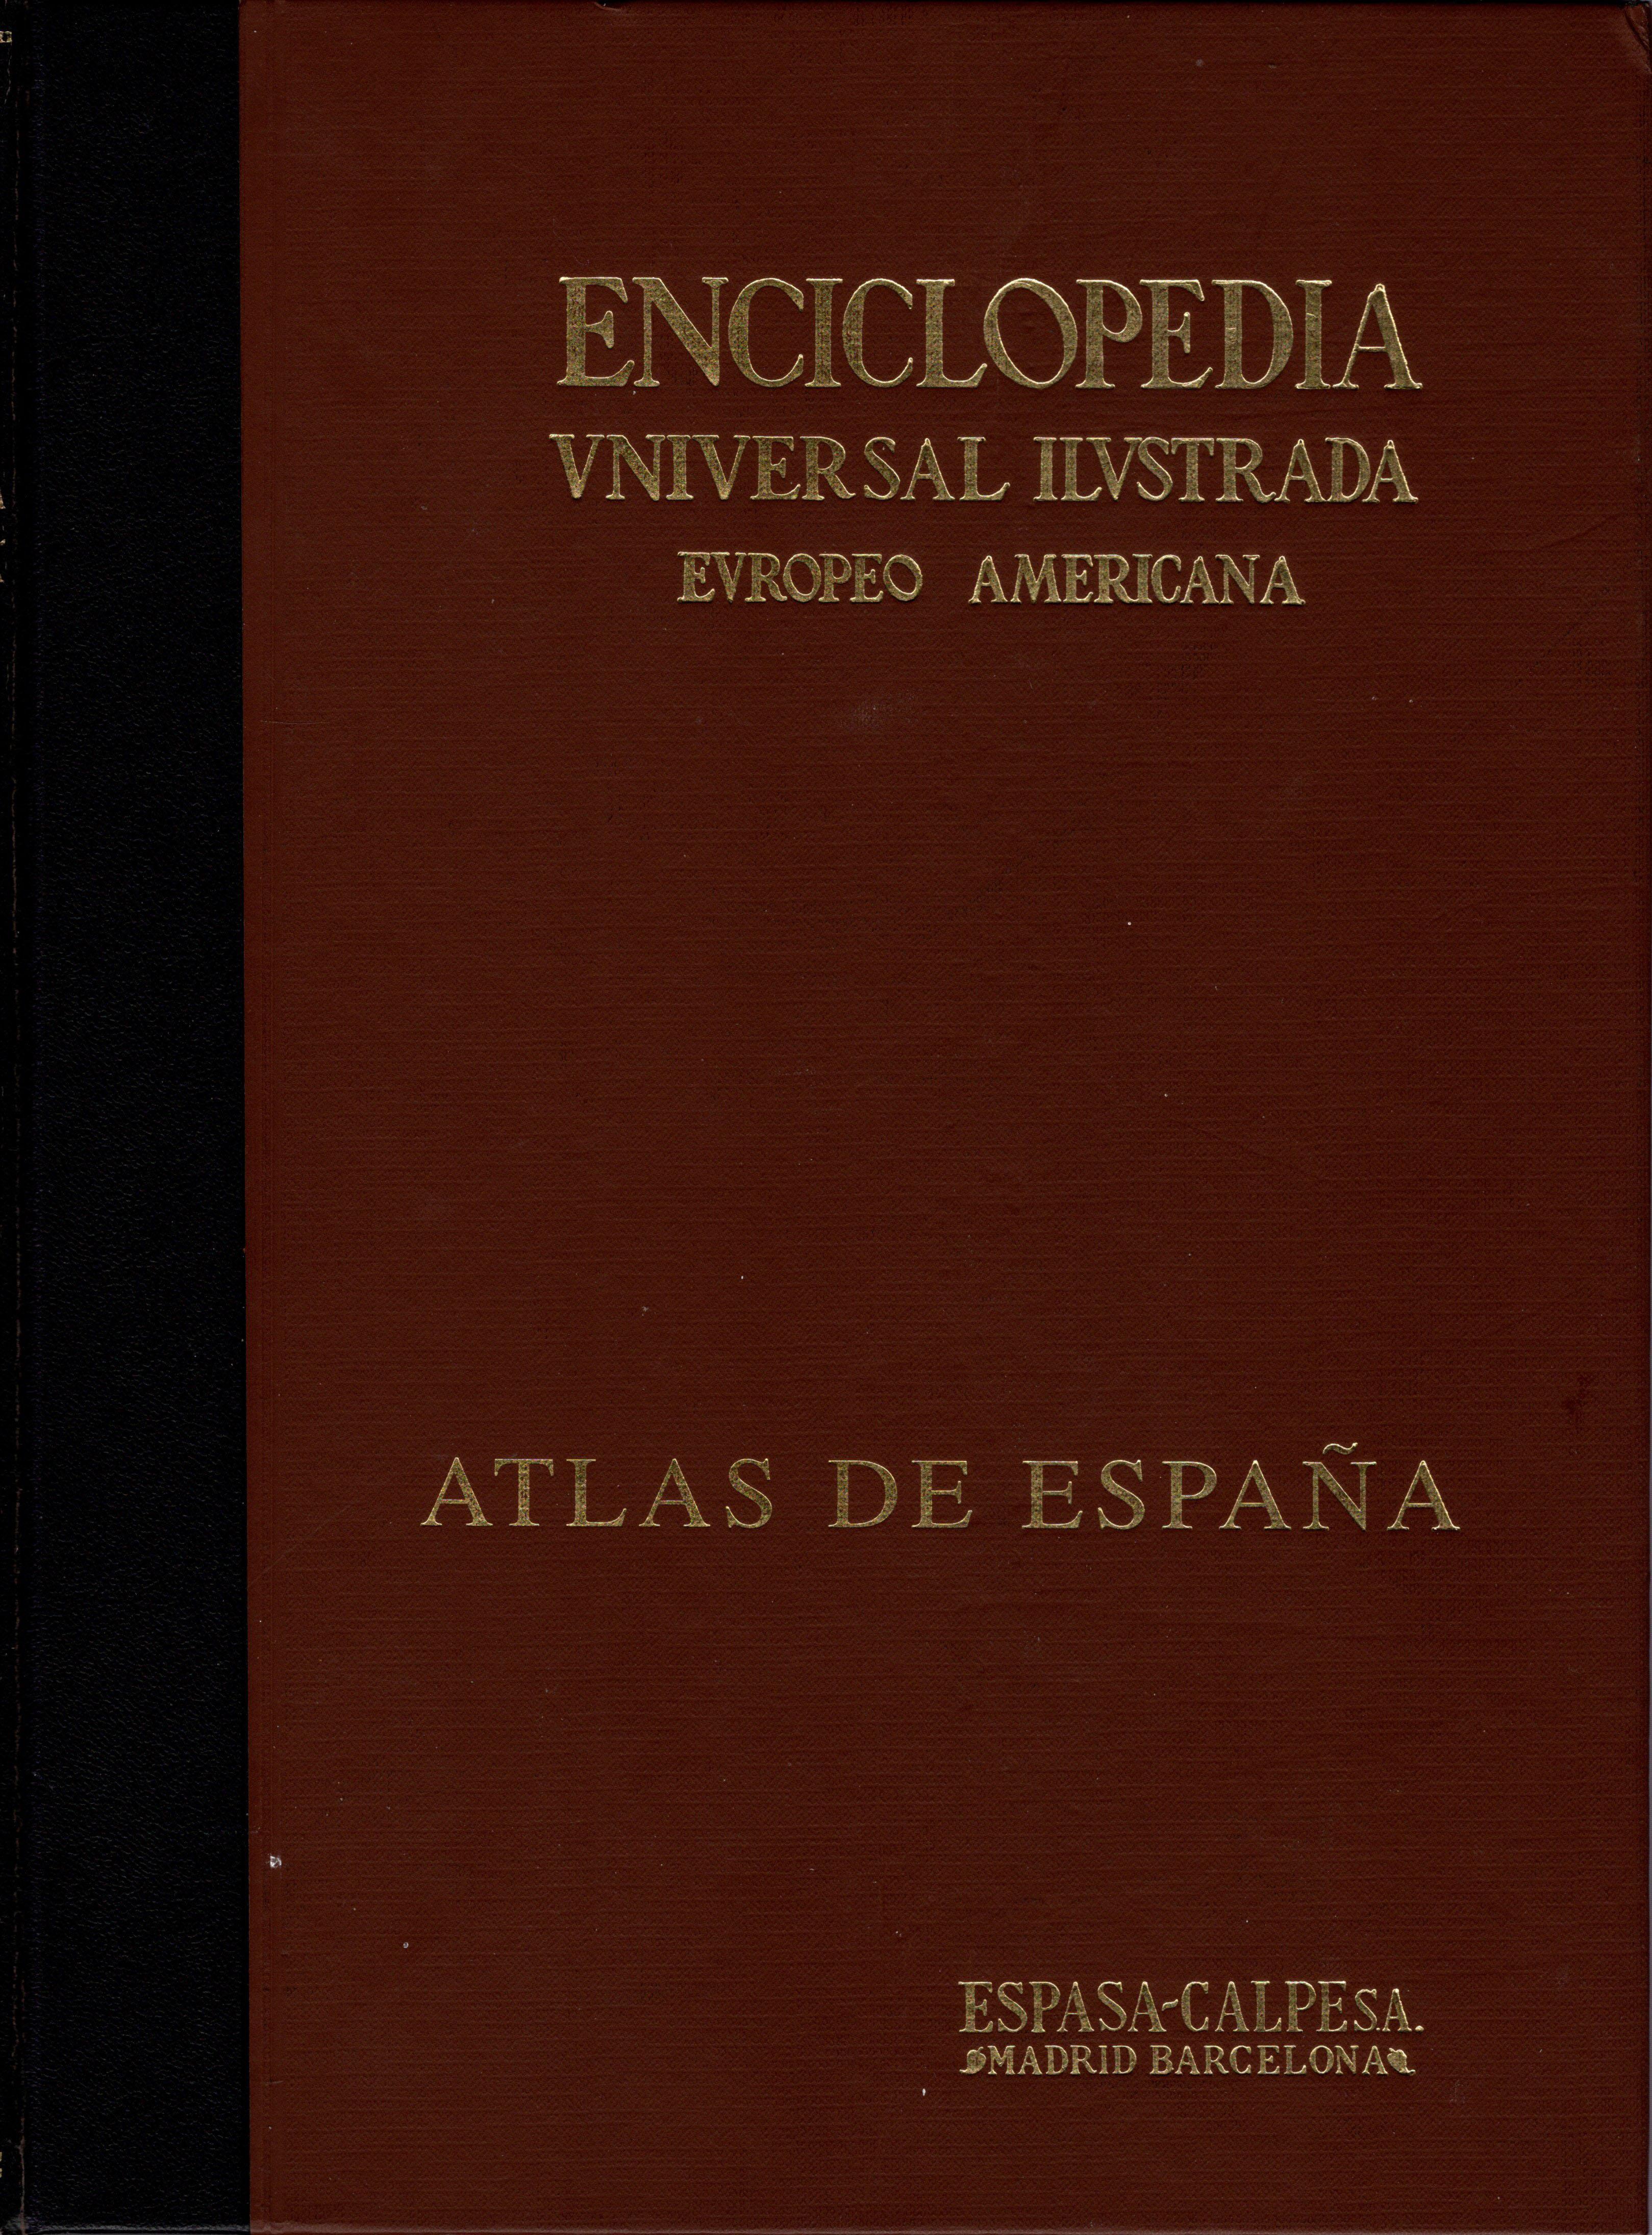 Enciclopedia Universal Ilustrada Europeo Americana - Atlas de España